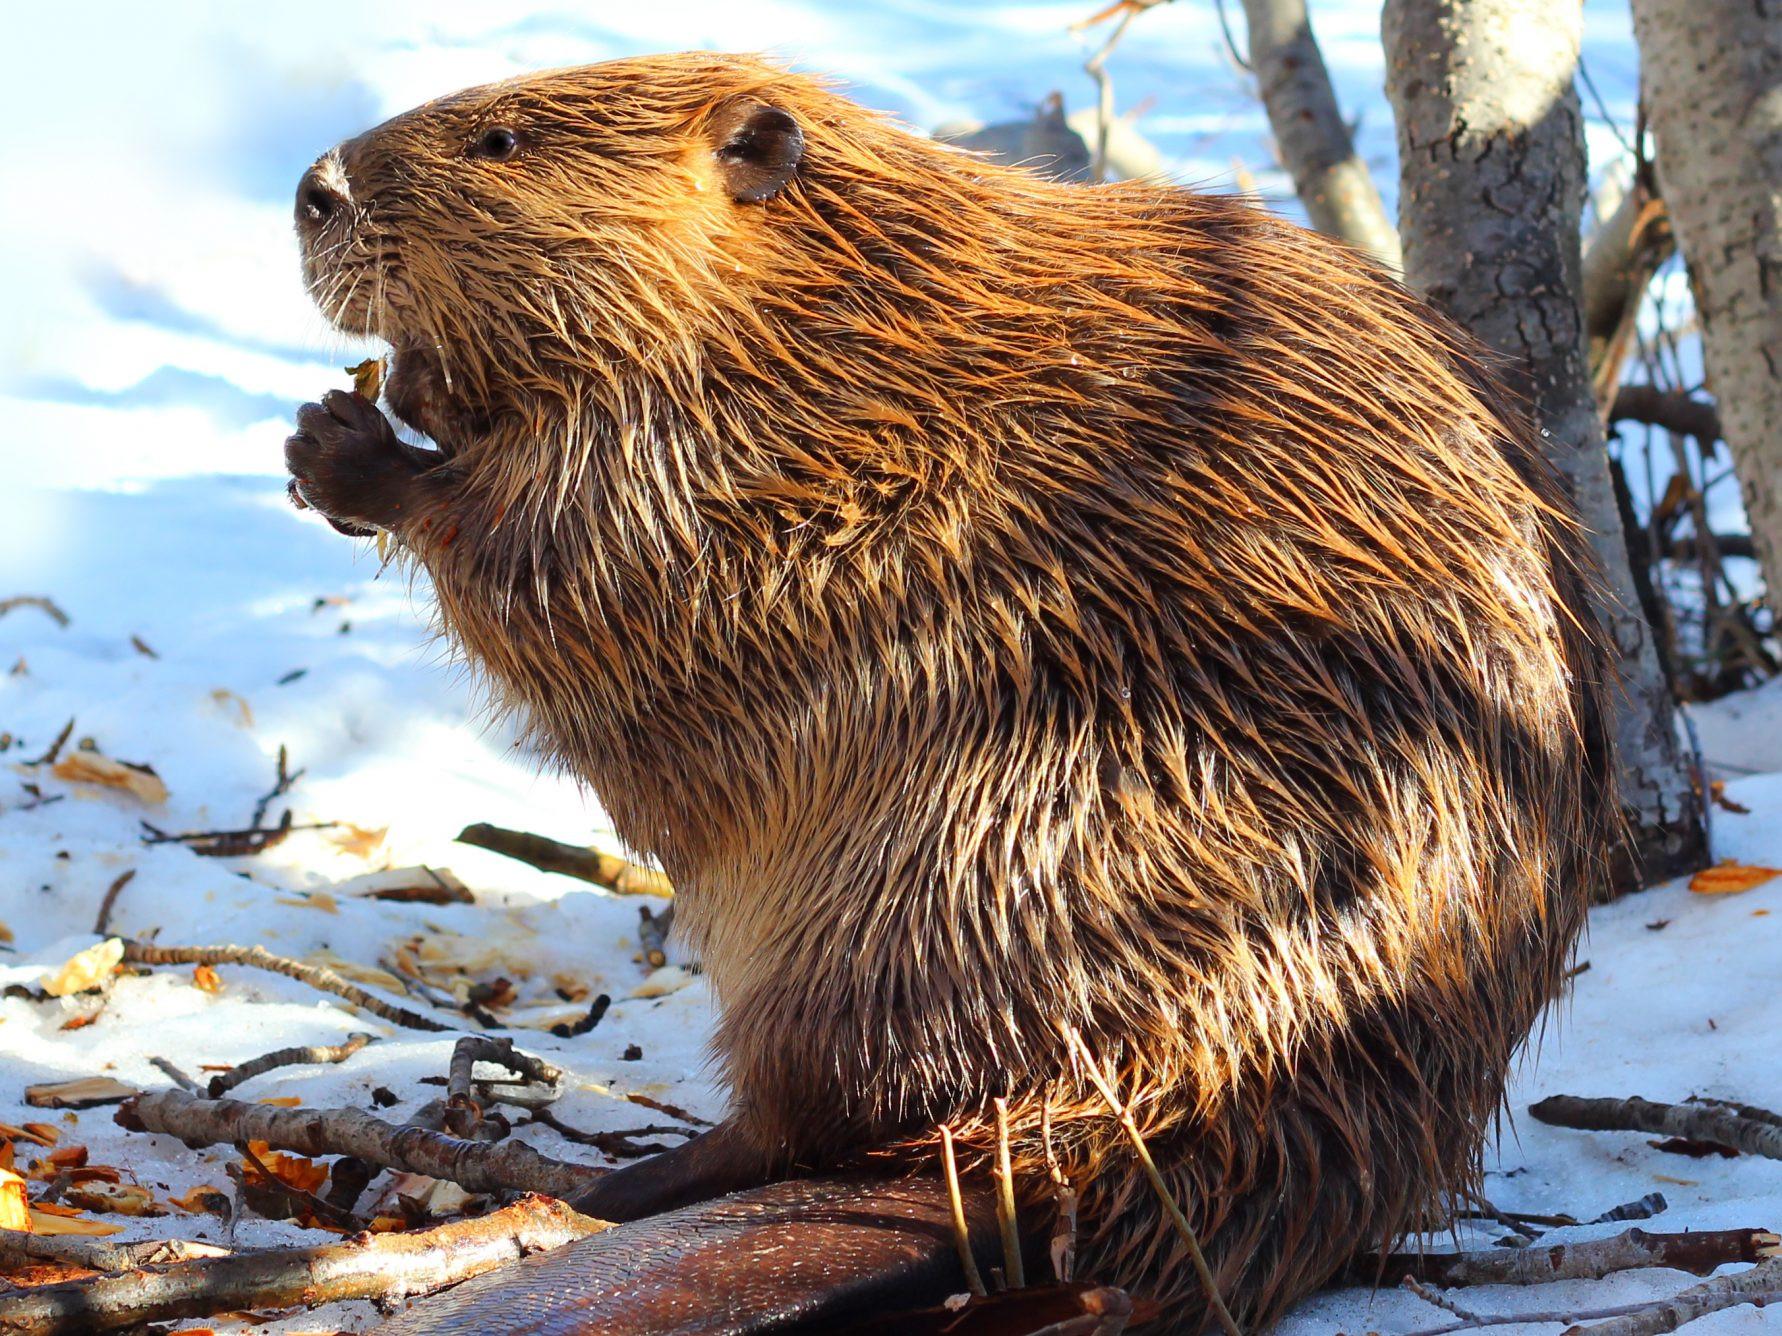 Un animal - Le castor du Canada